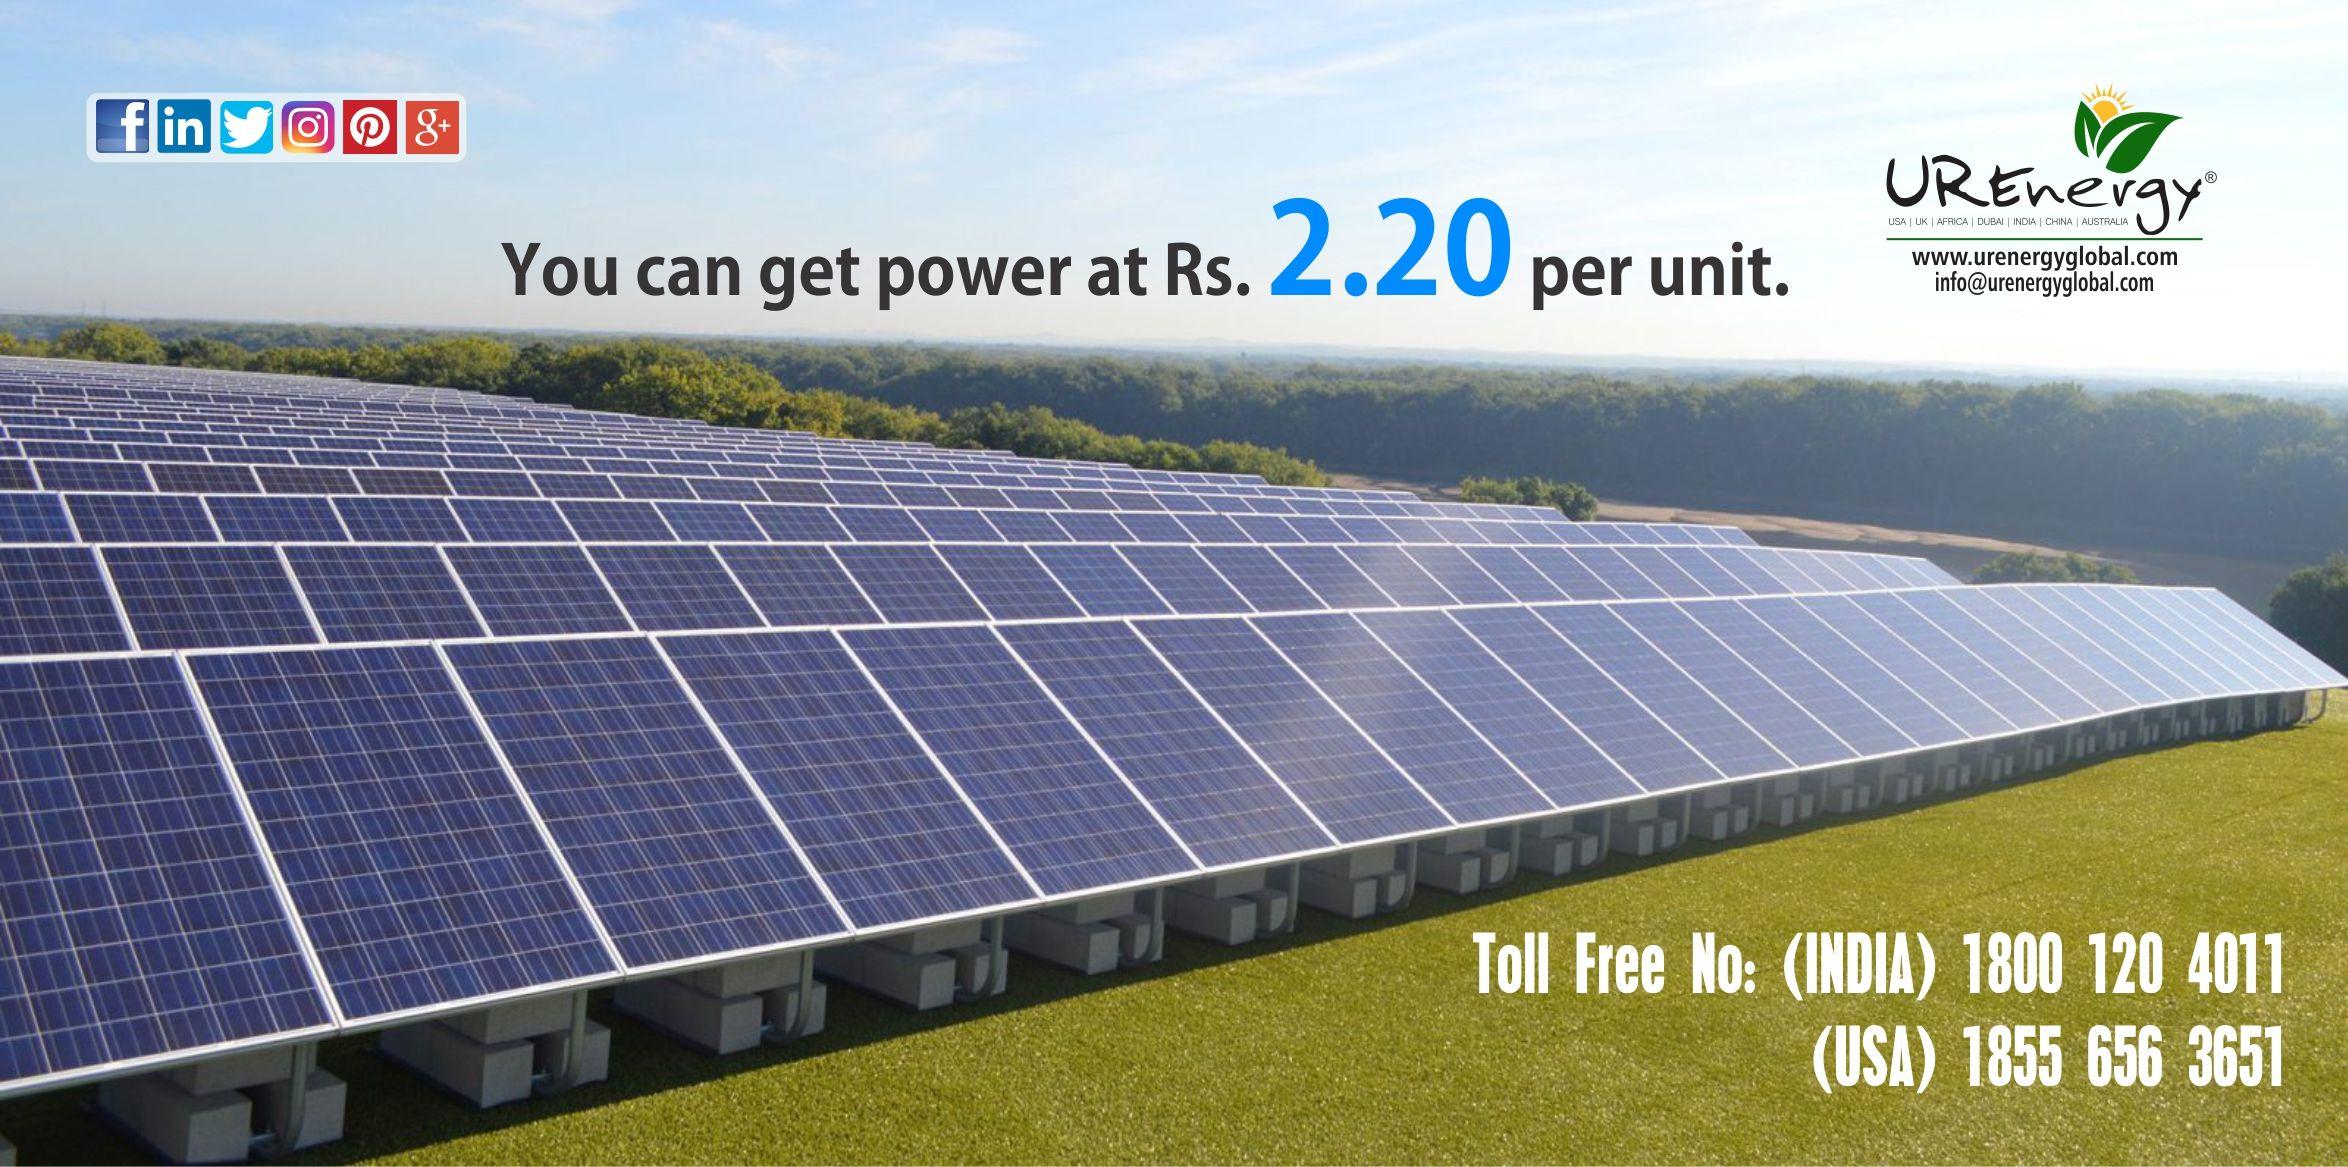 Rooftop Solar Panel Inverters Water Pump Solar Epc Gujarat India U R Energy Solar Panels Most Efficient Solar Panels Solar Energy Panels